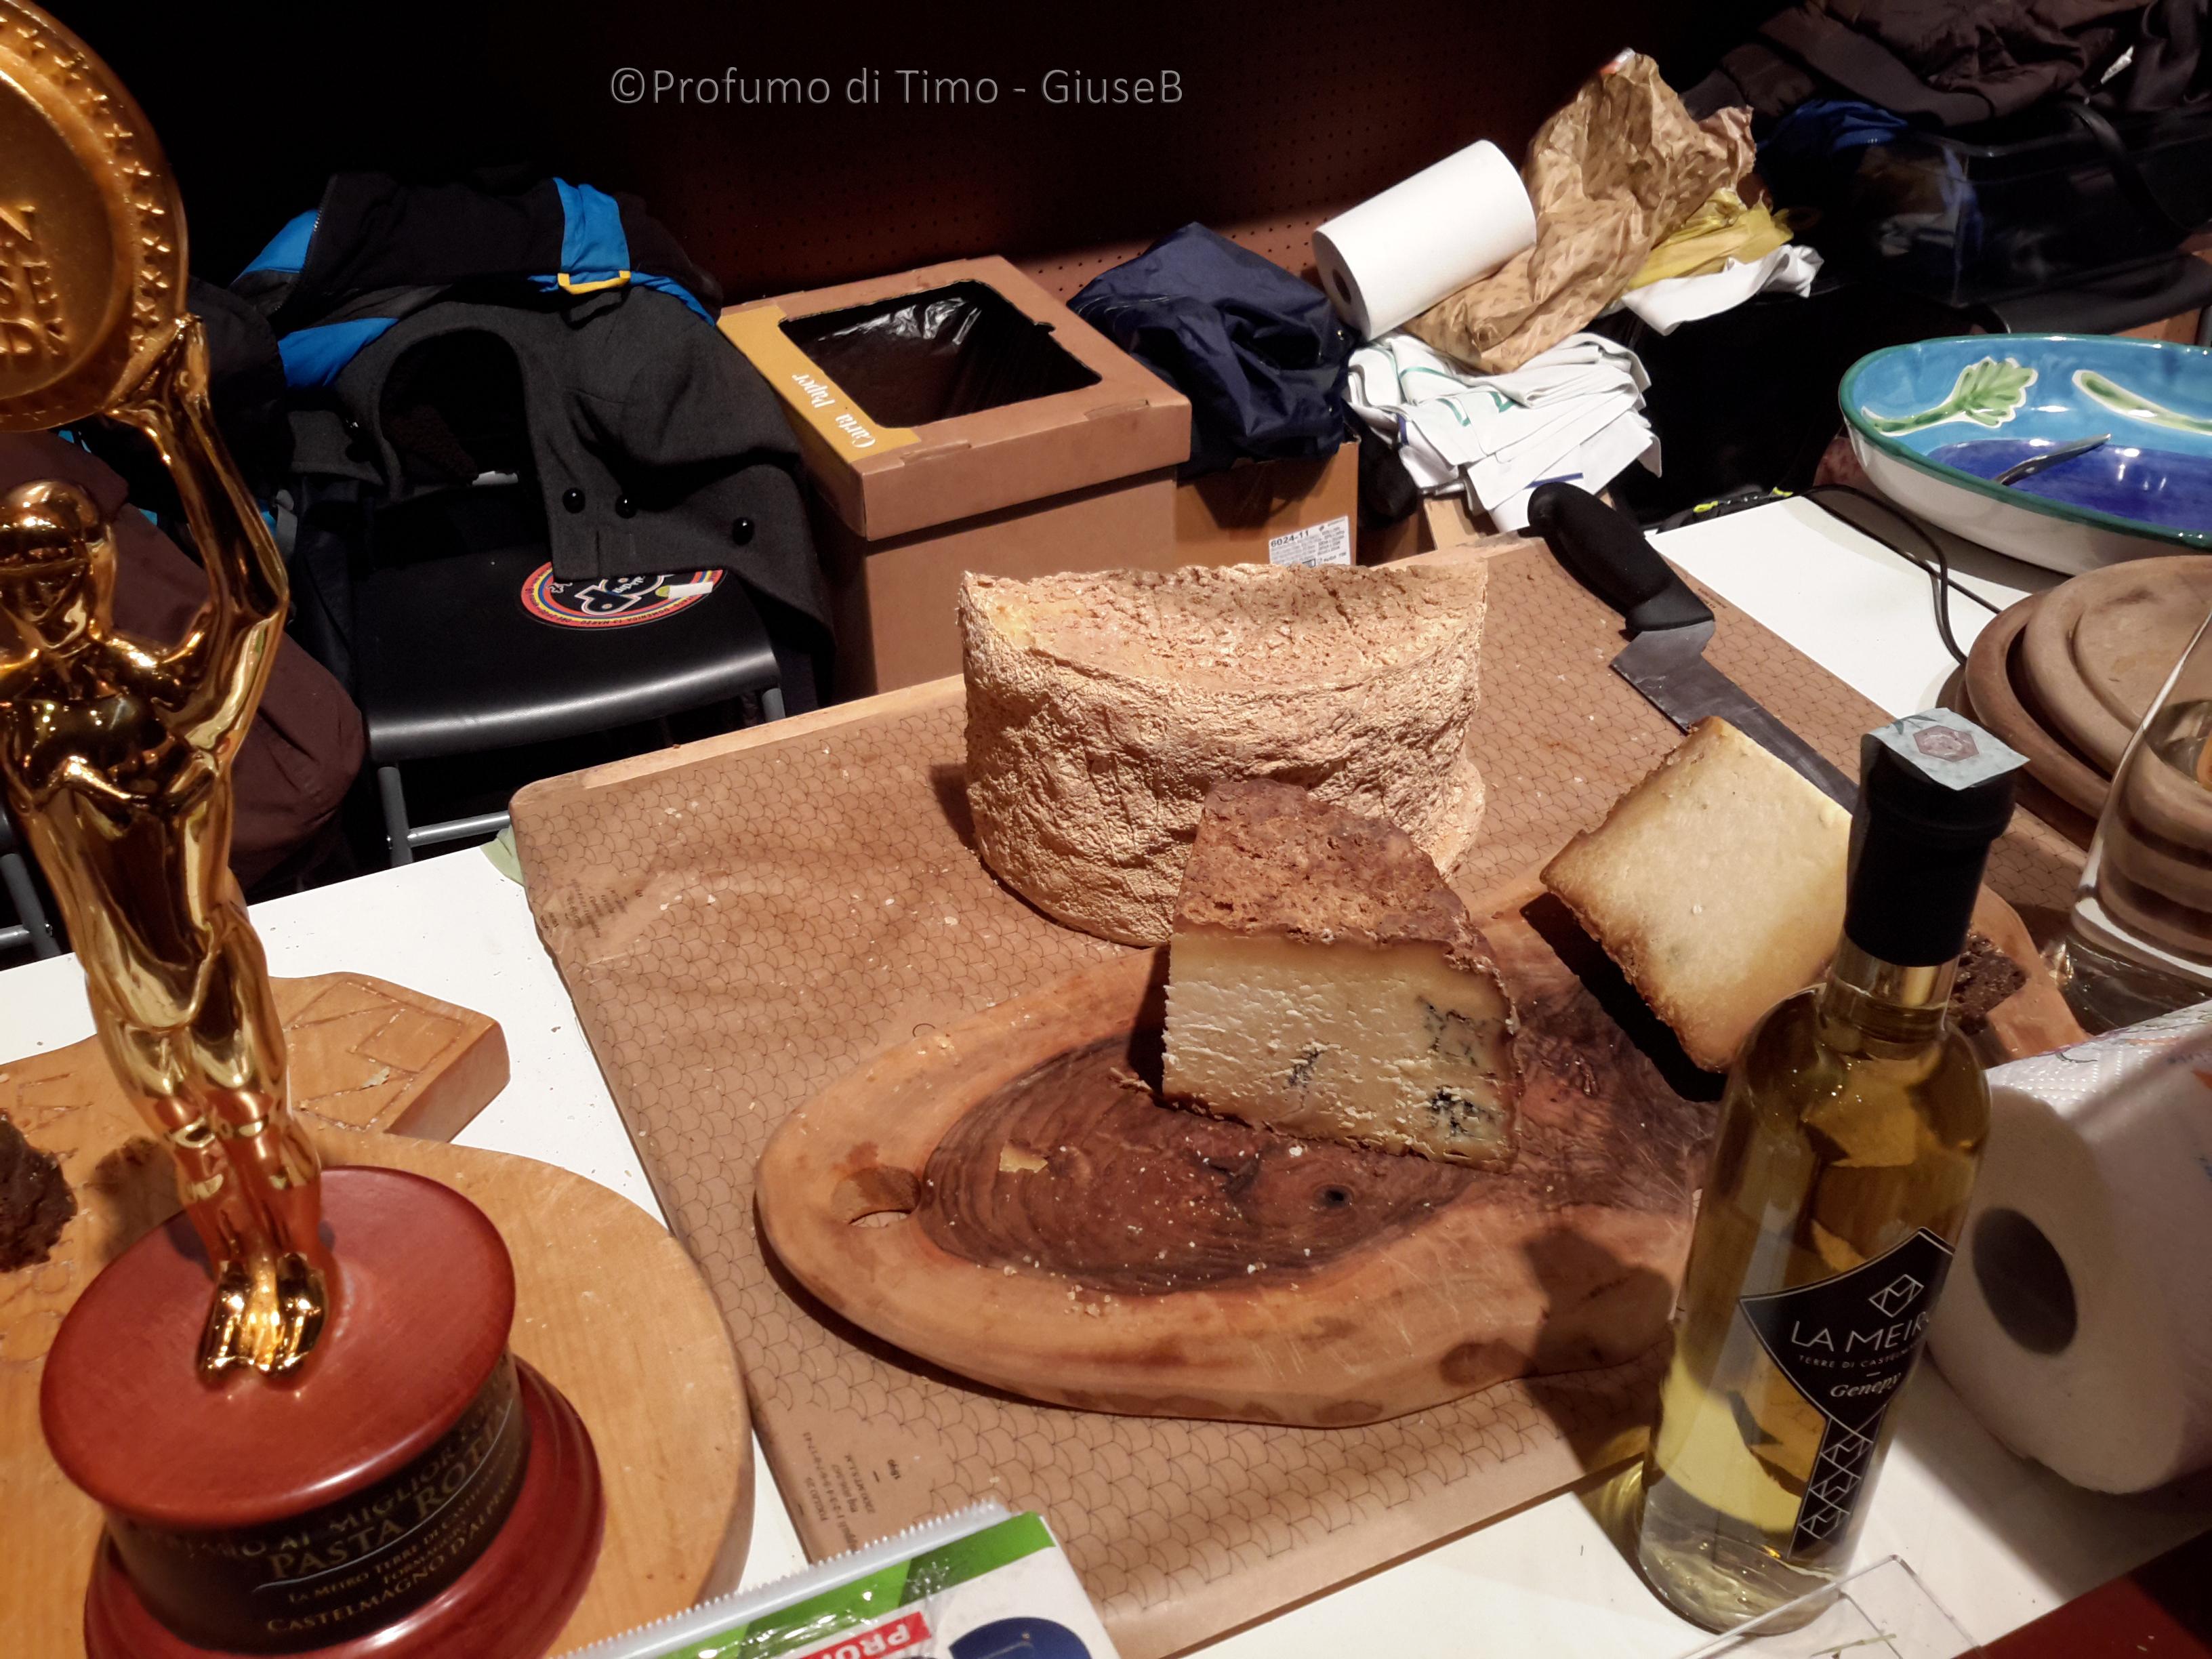 taste2016 #profumoditimo #giuseB (26)